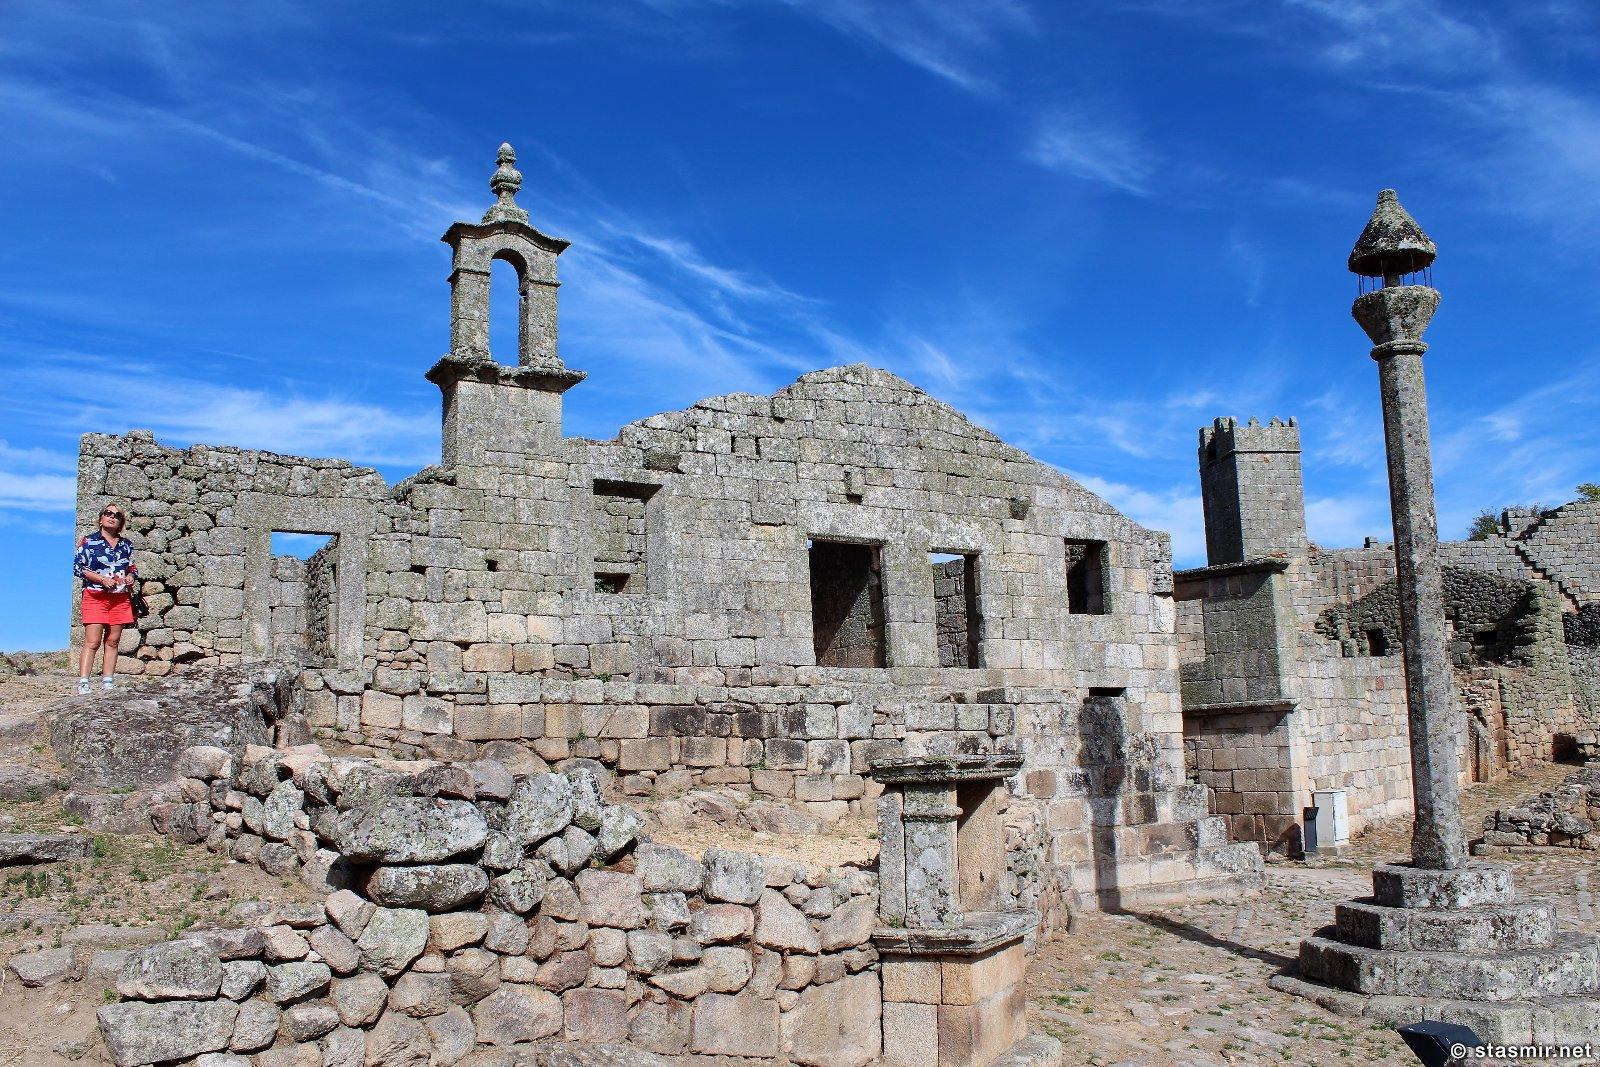 Marialva, замок Мариалва, Португалия, Aldeia Histórica, фото Стасмир, photo Stasmir